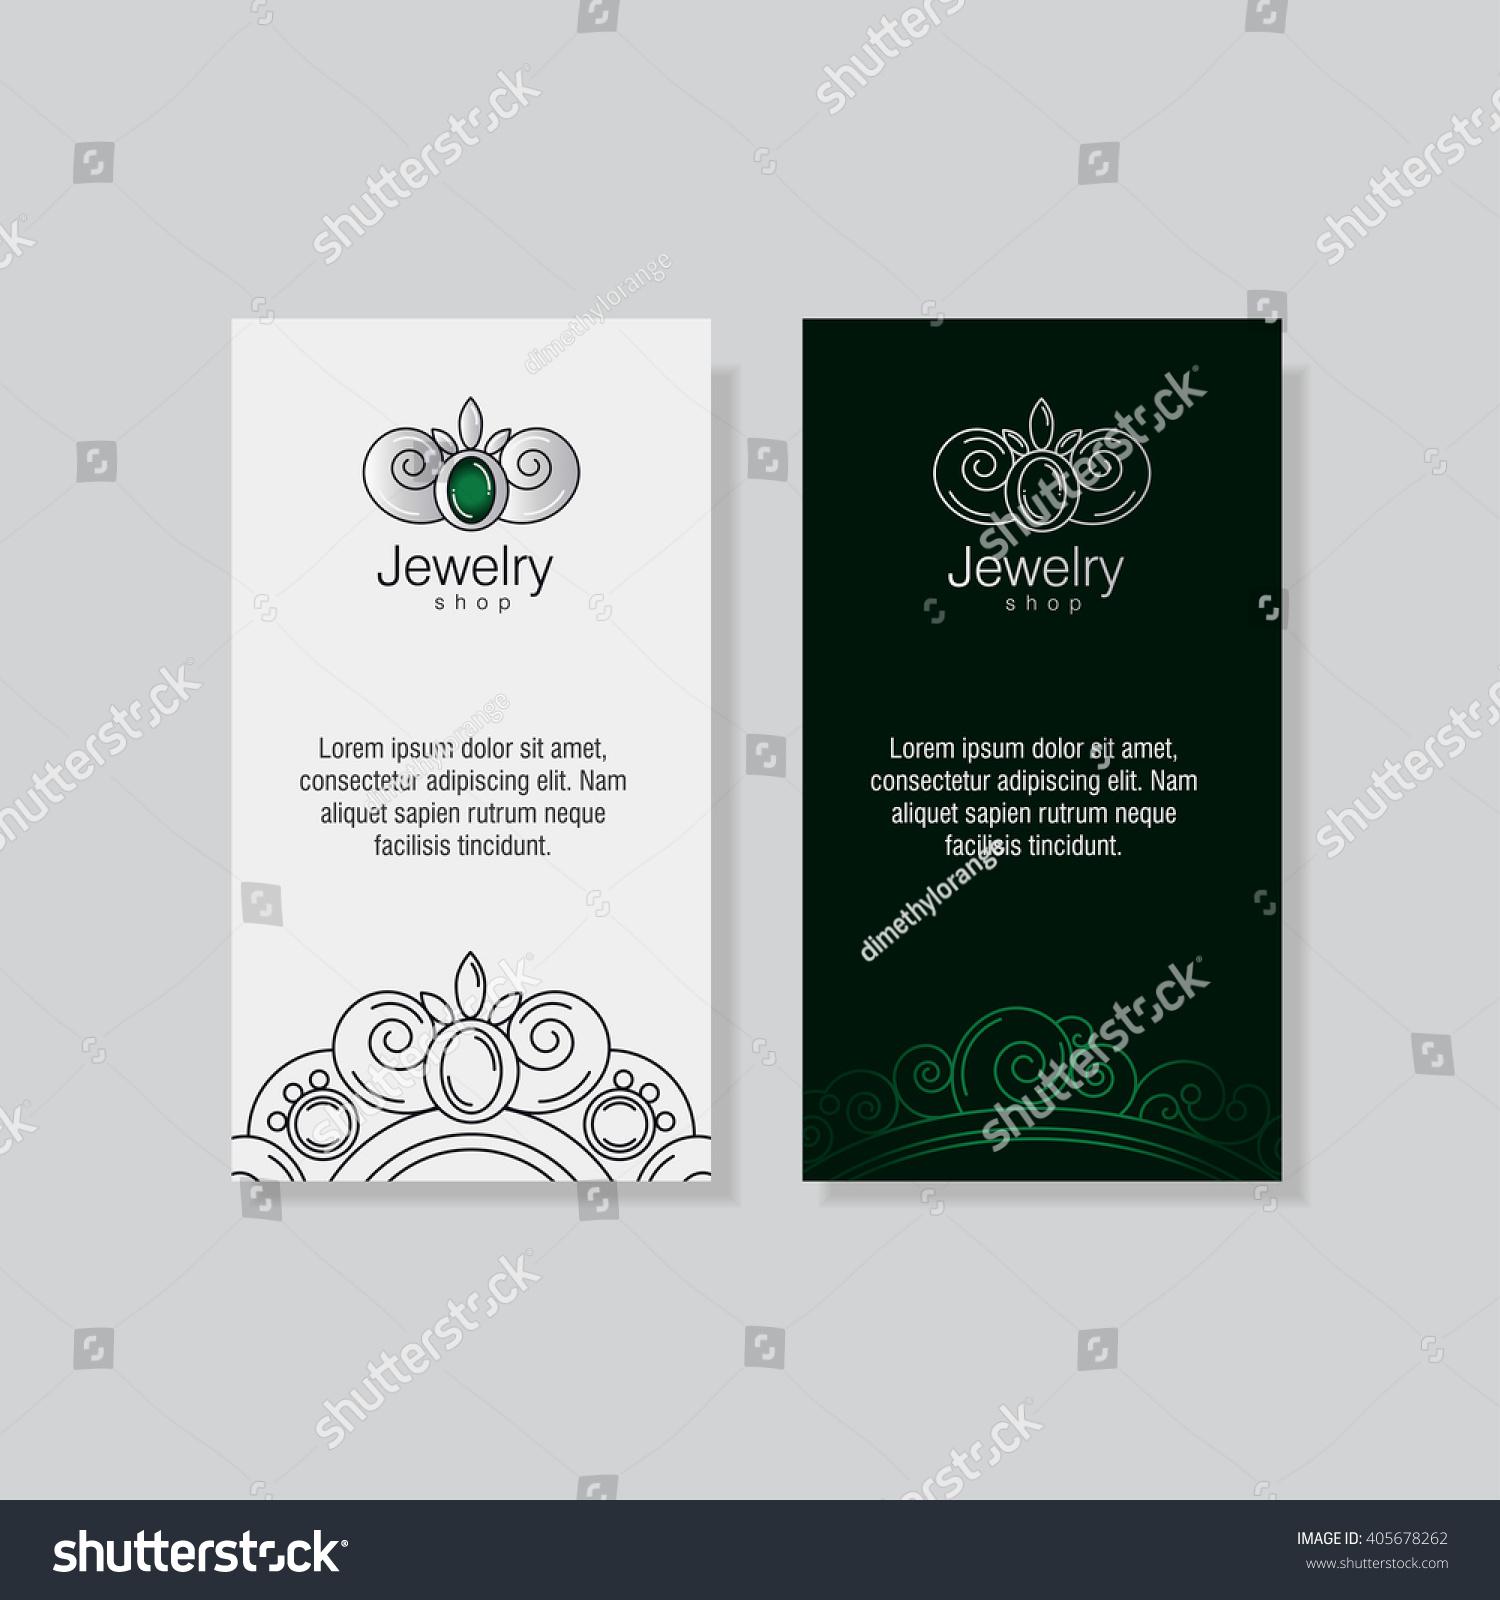 Logo Business Card Templates Jeweler Workshop Stock Vector ...